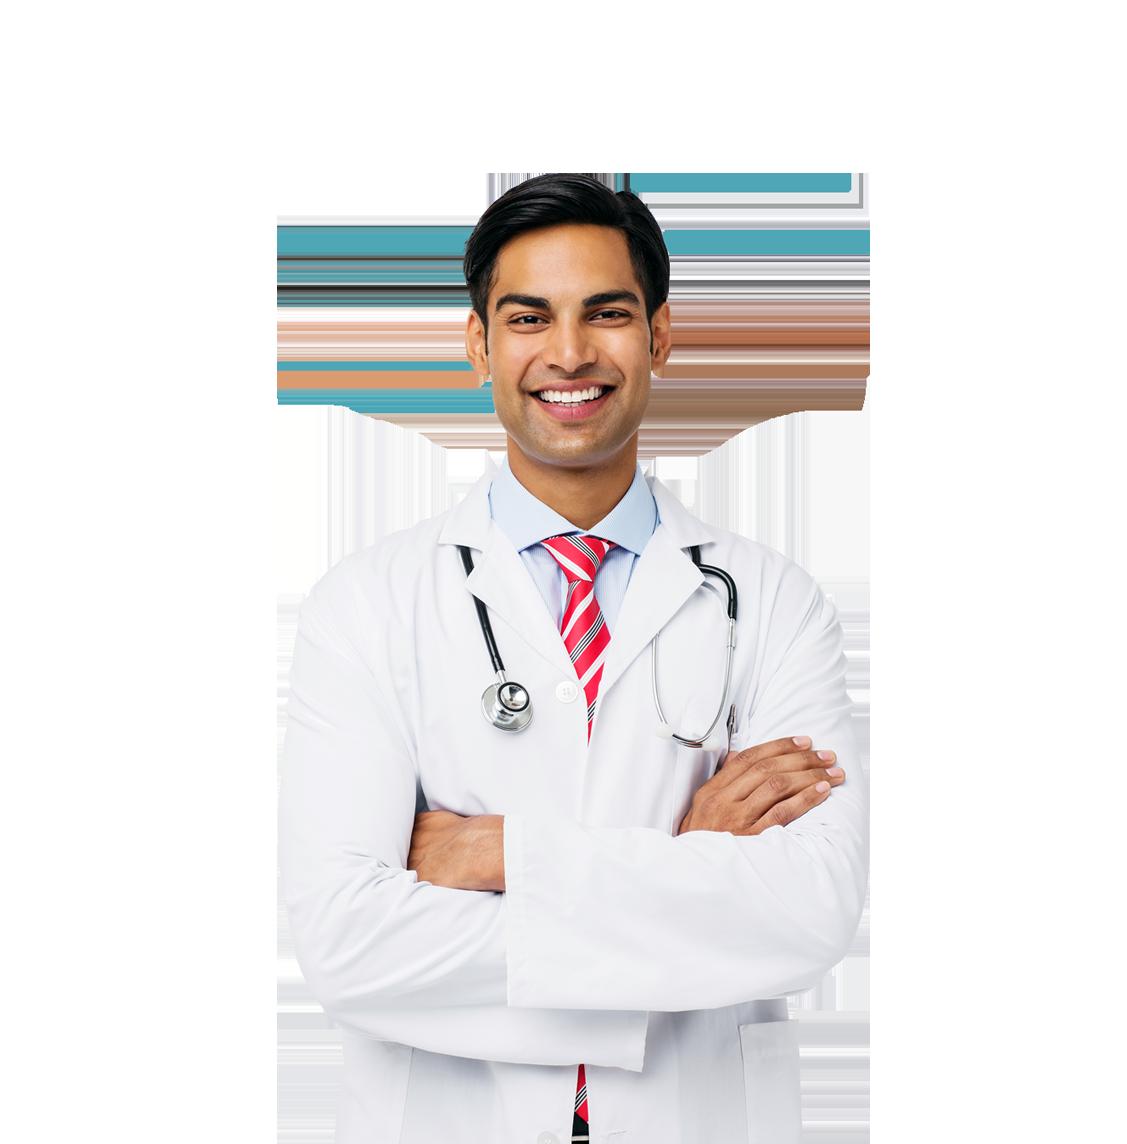 orthopedic message on hold